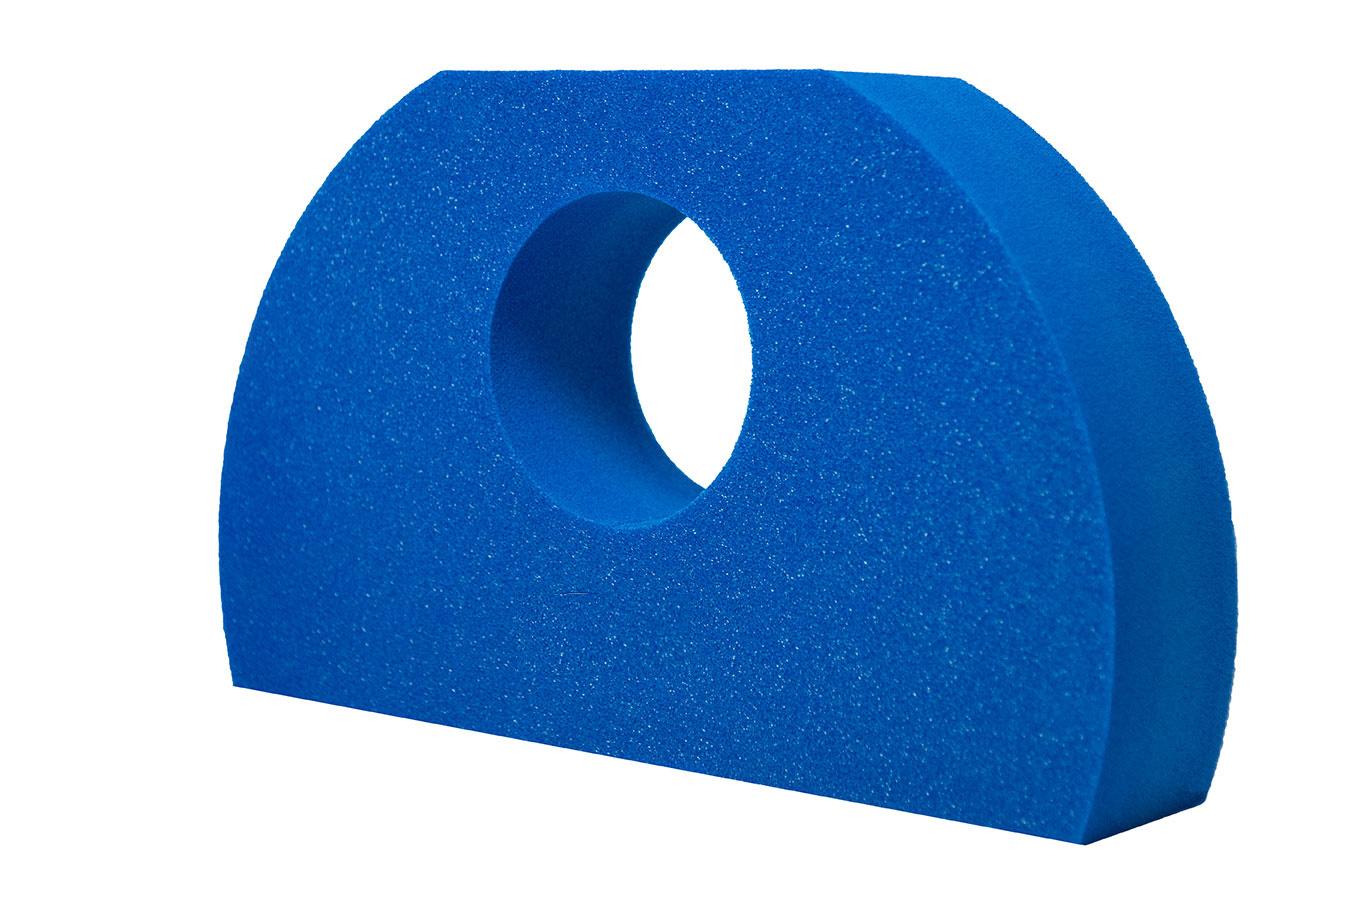 Cavaletti blok XS - schuimrubber